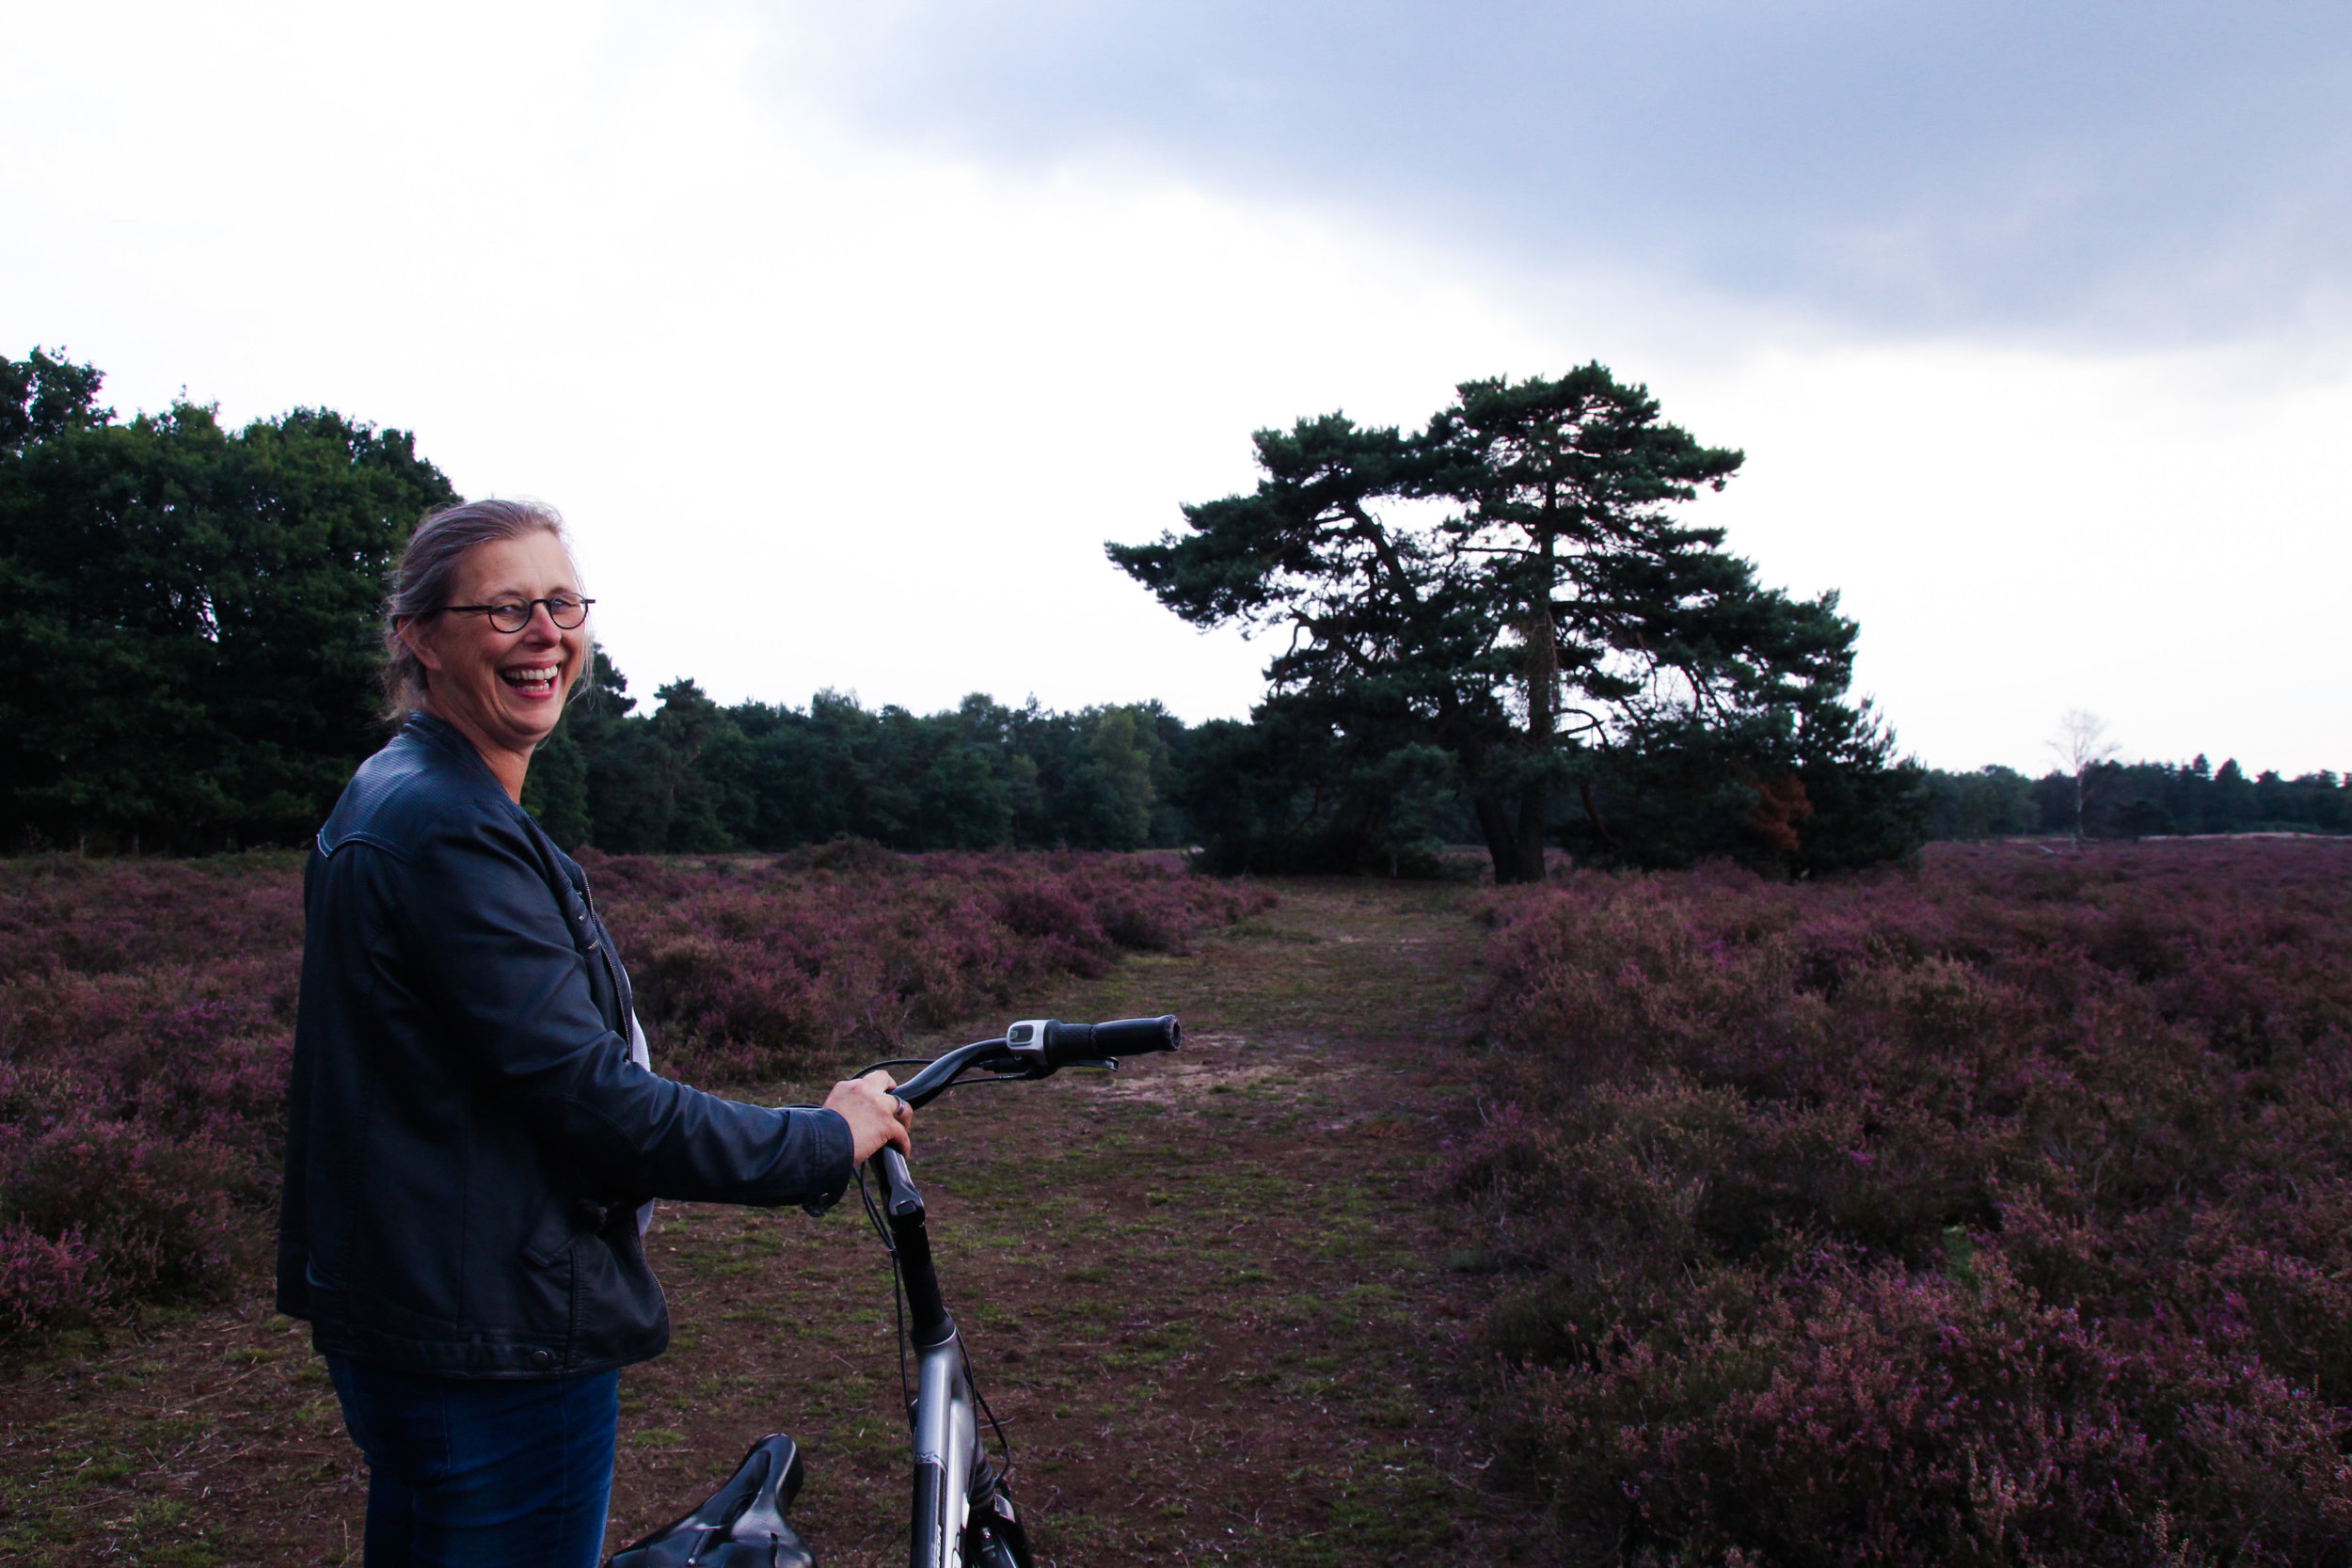 Casual bike rides